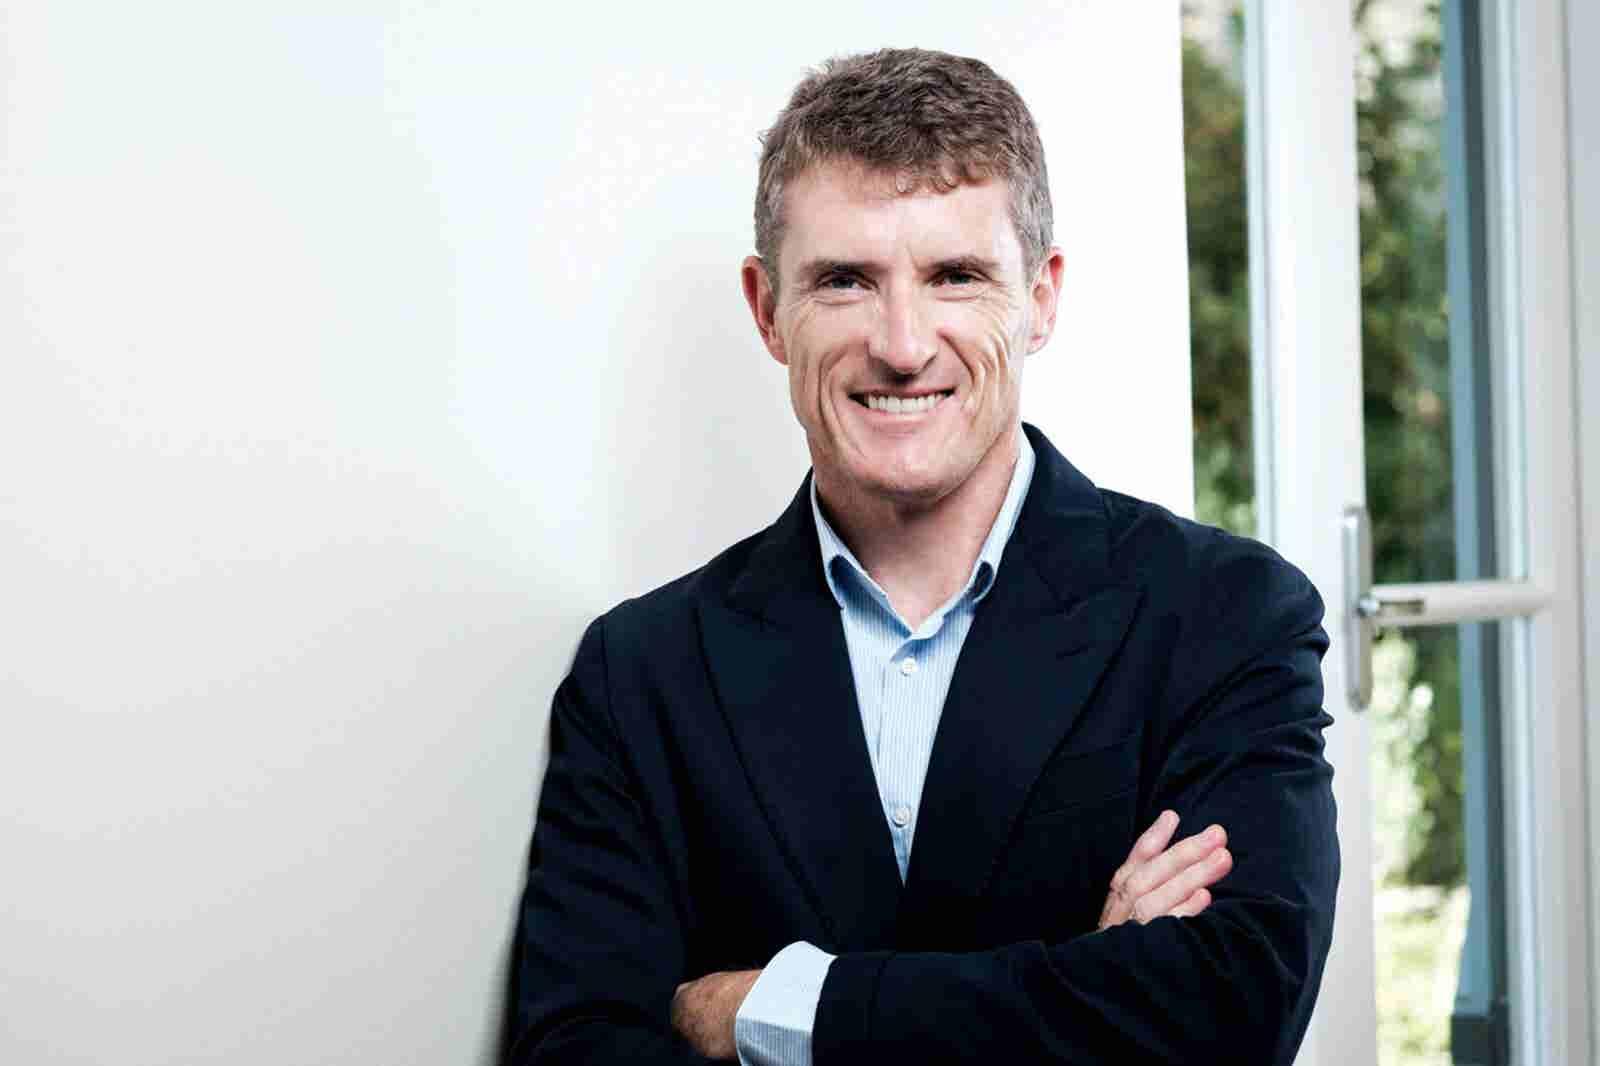 5 Lessons in Growth From Former Dimension Data CEO, Brett Dawson